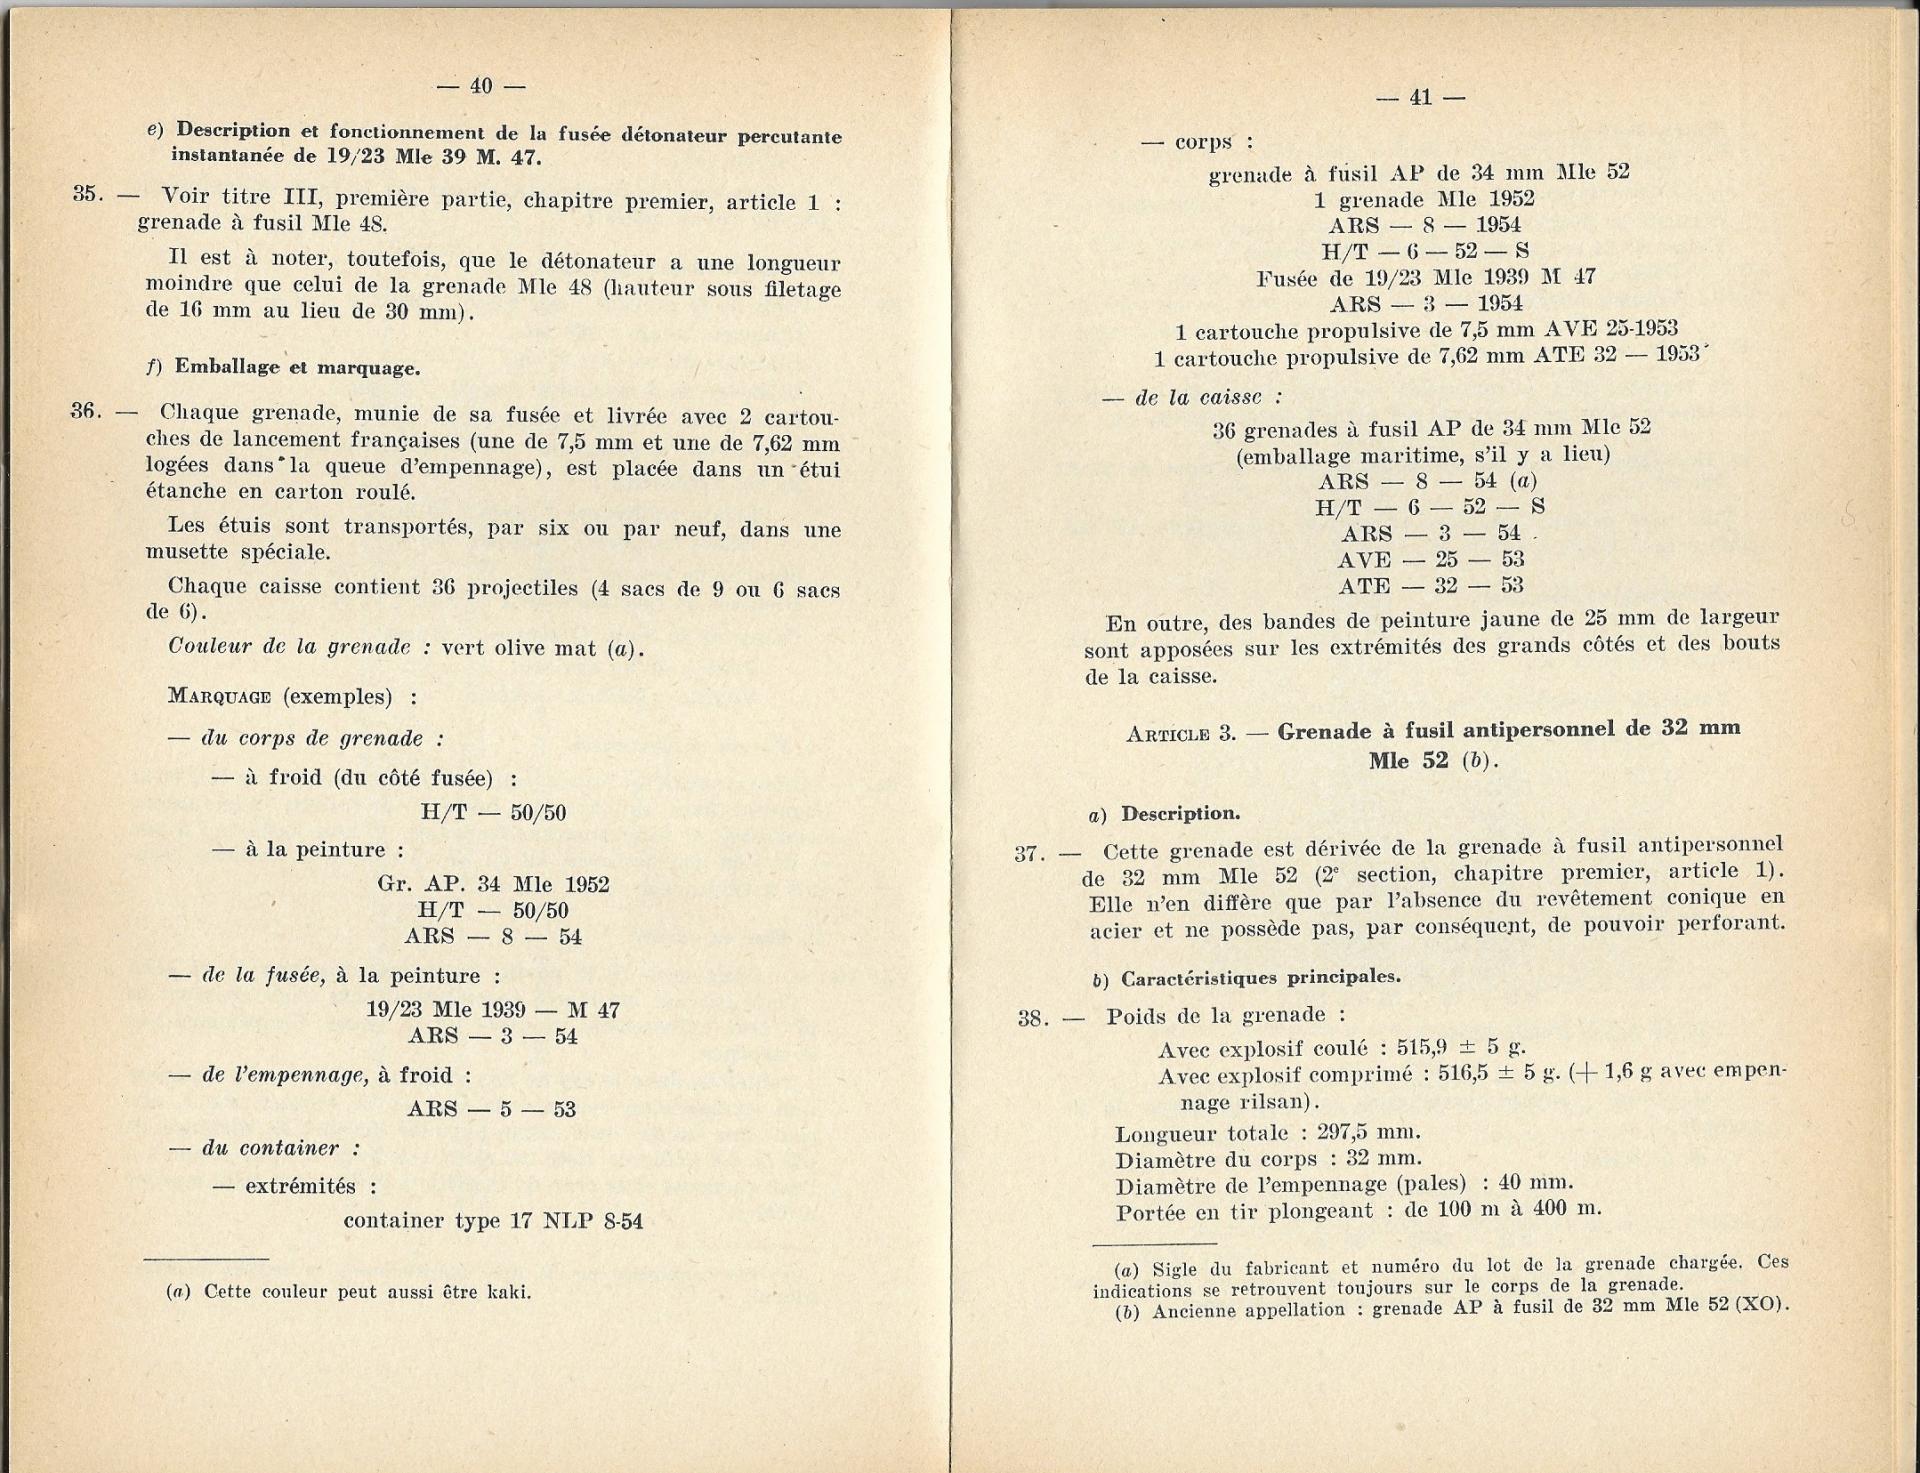 Grenades a fusil 1957 p40 41 1